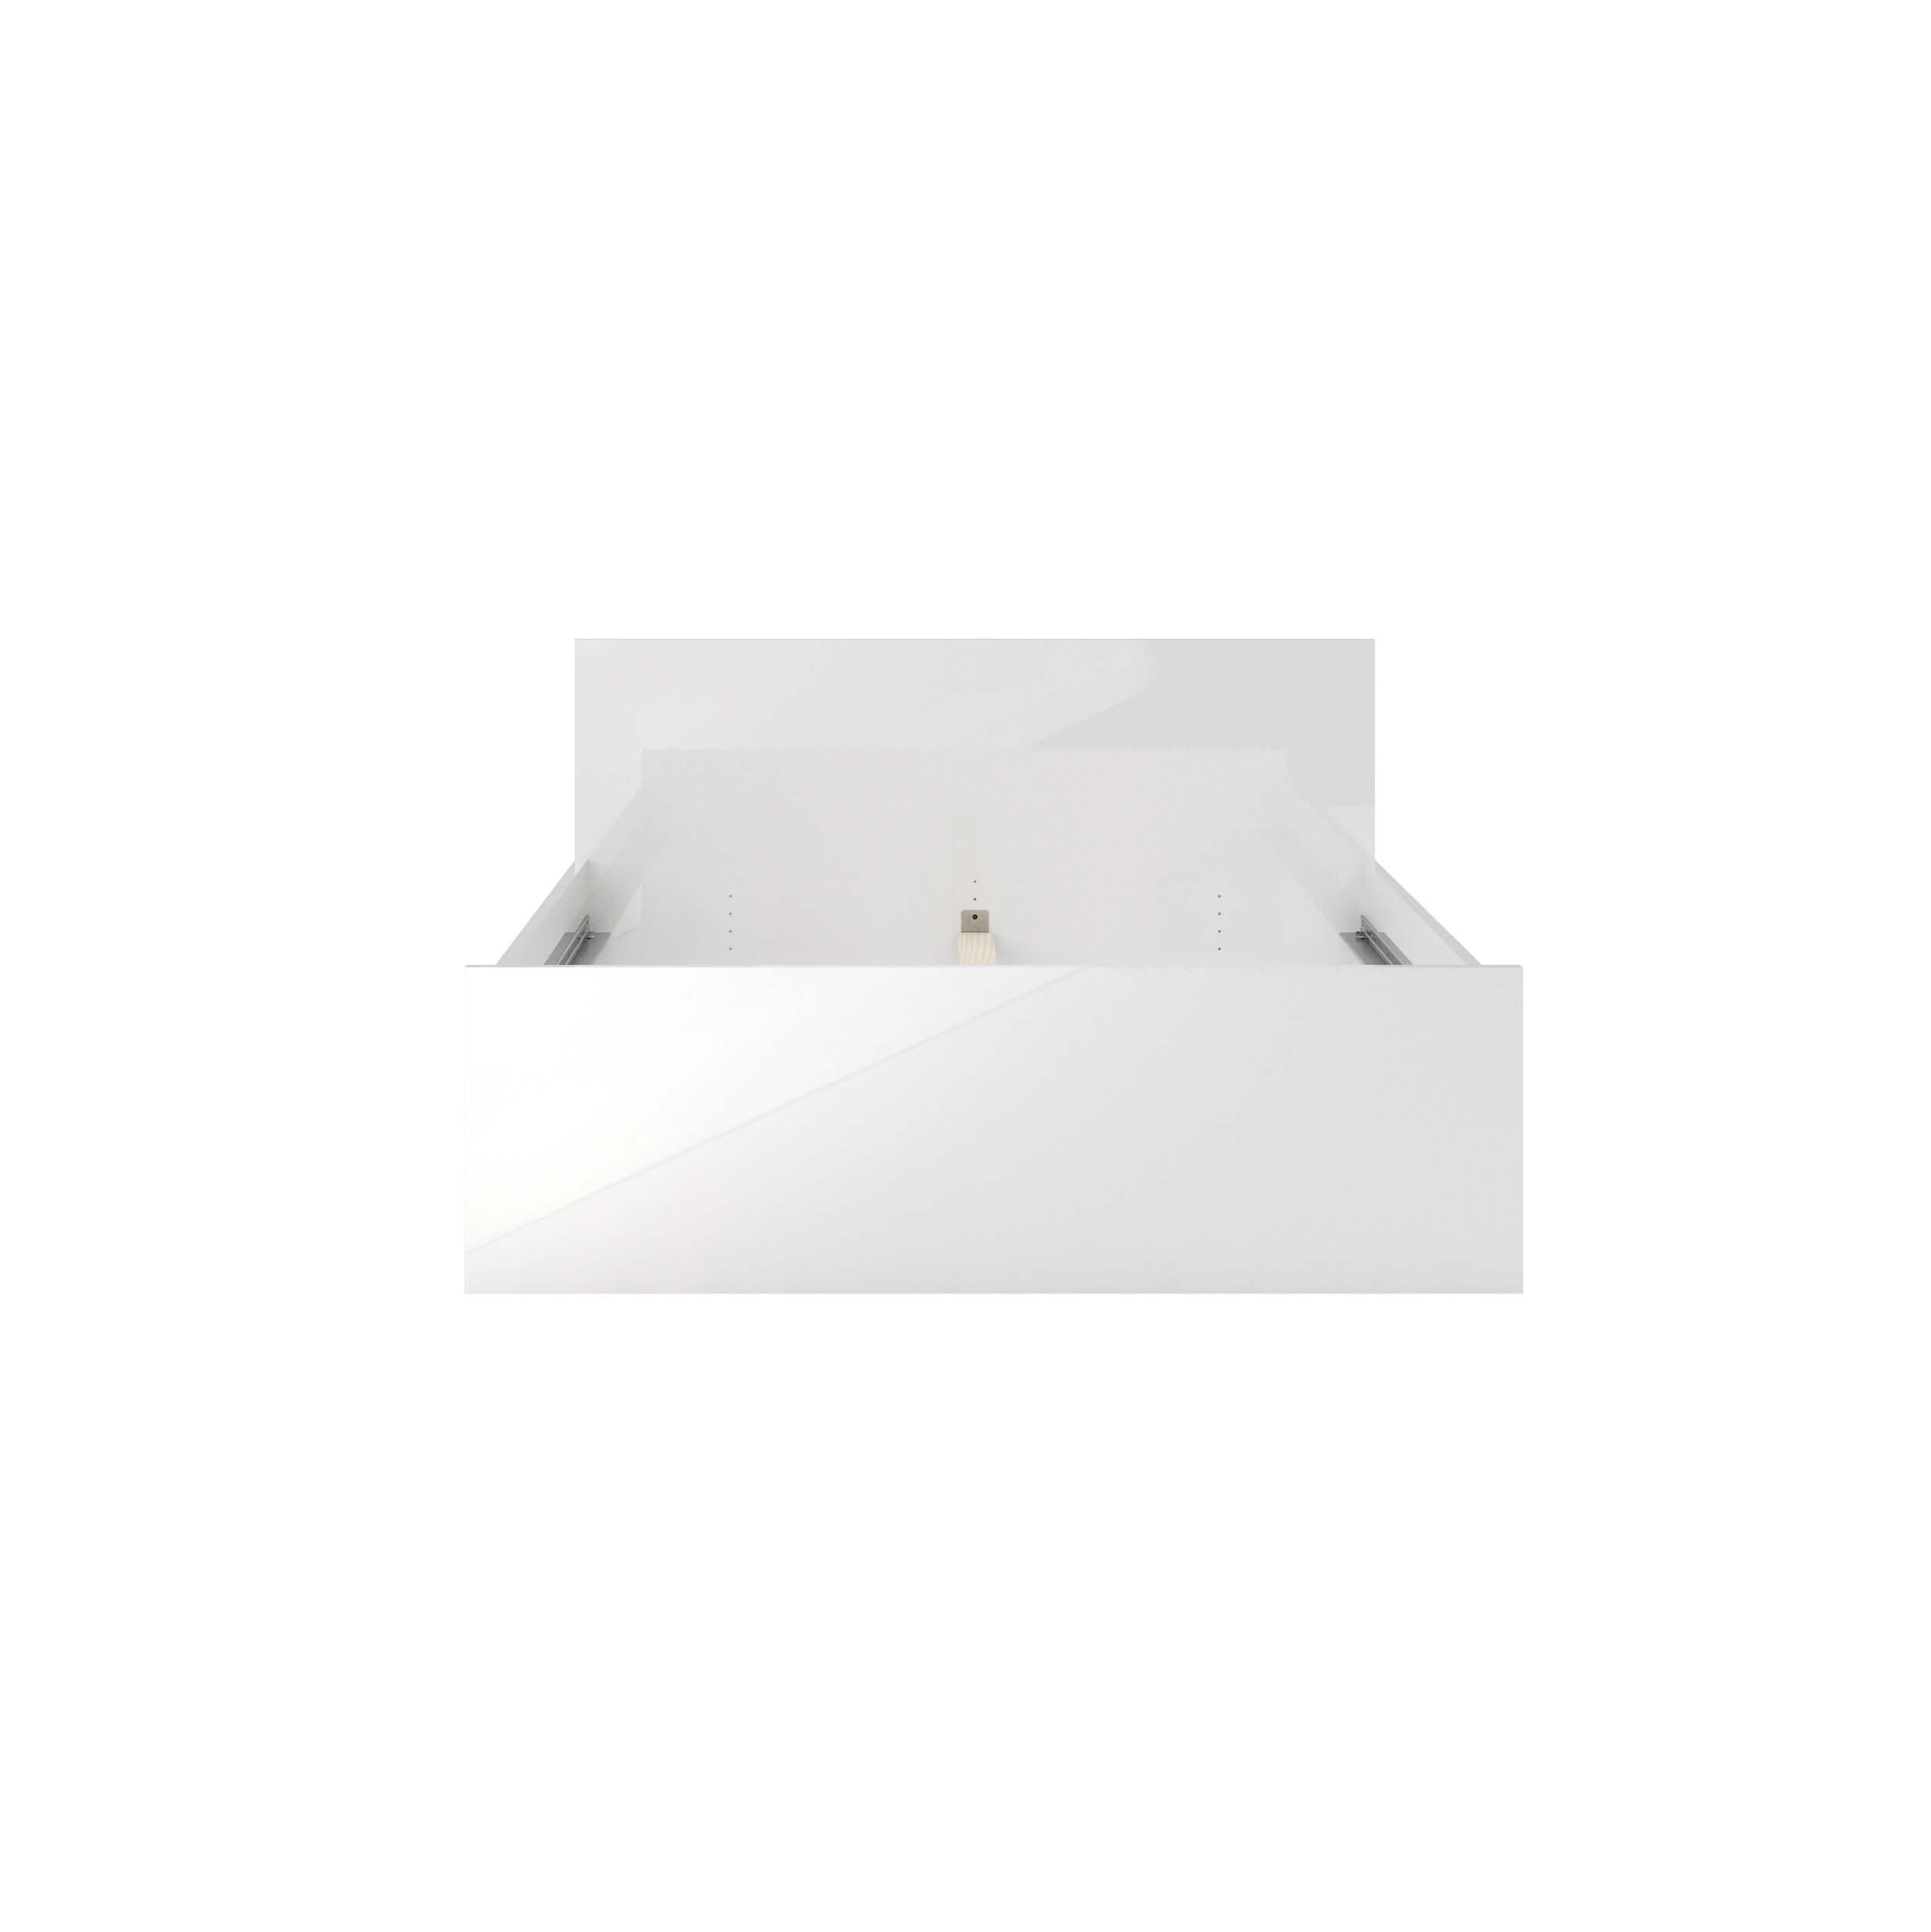 Naia sengeramme - hvid hjglans (140x200)